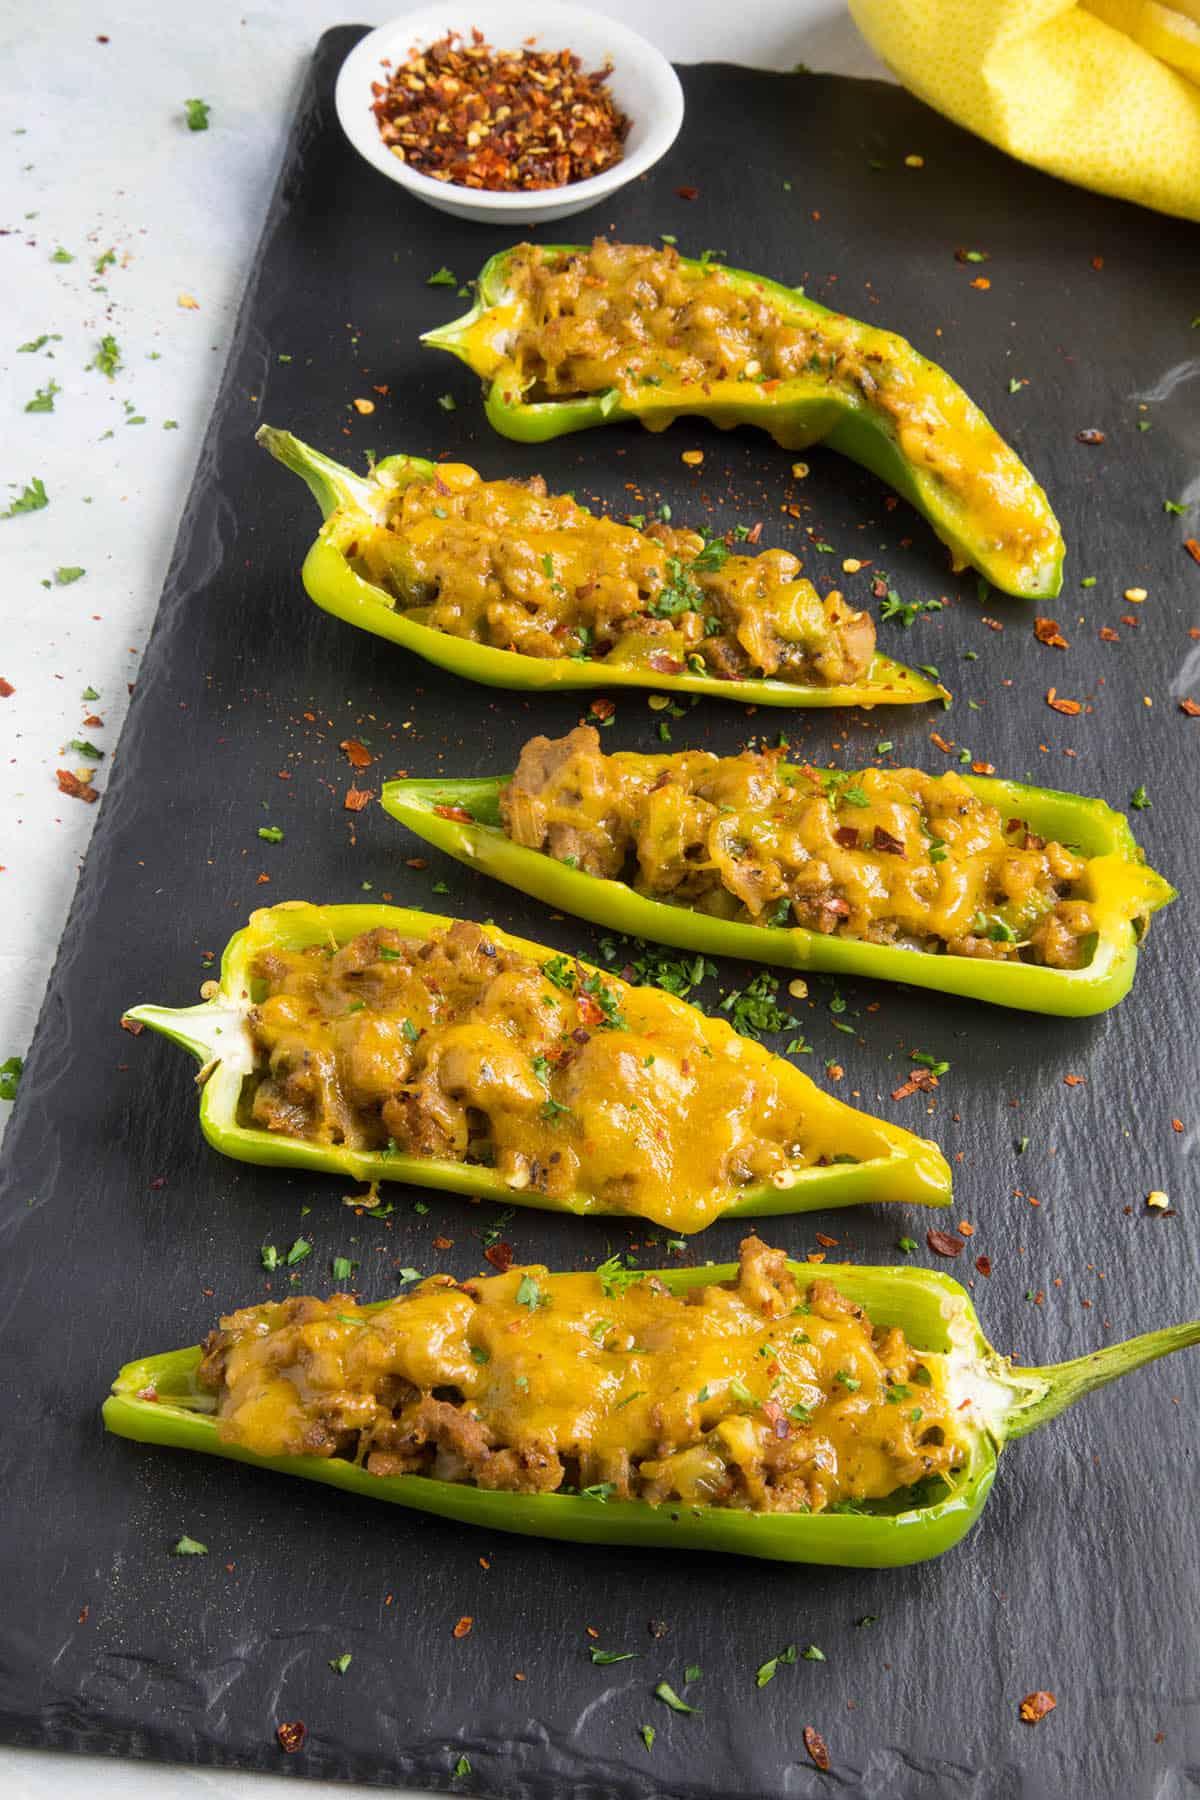 Turkey and Cheddar Stuffed Anaheim Peppers Recipe